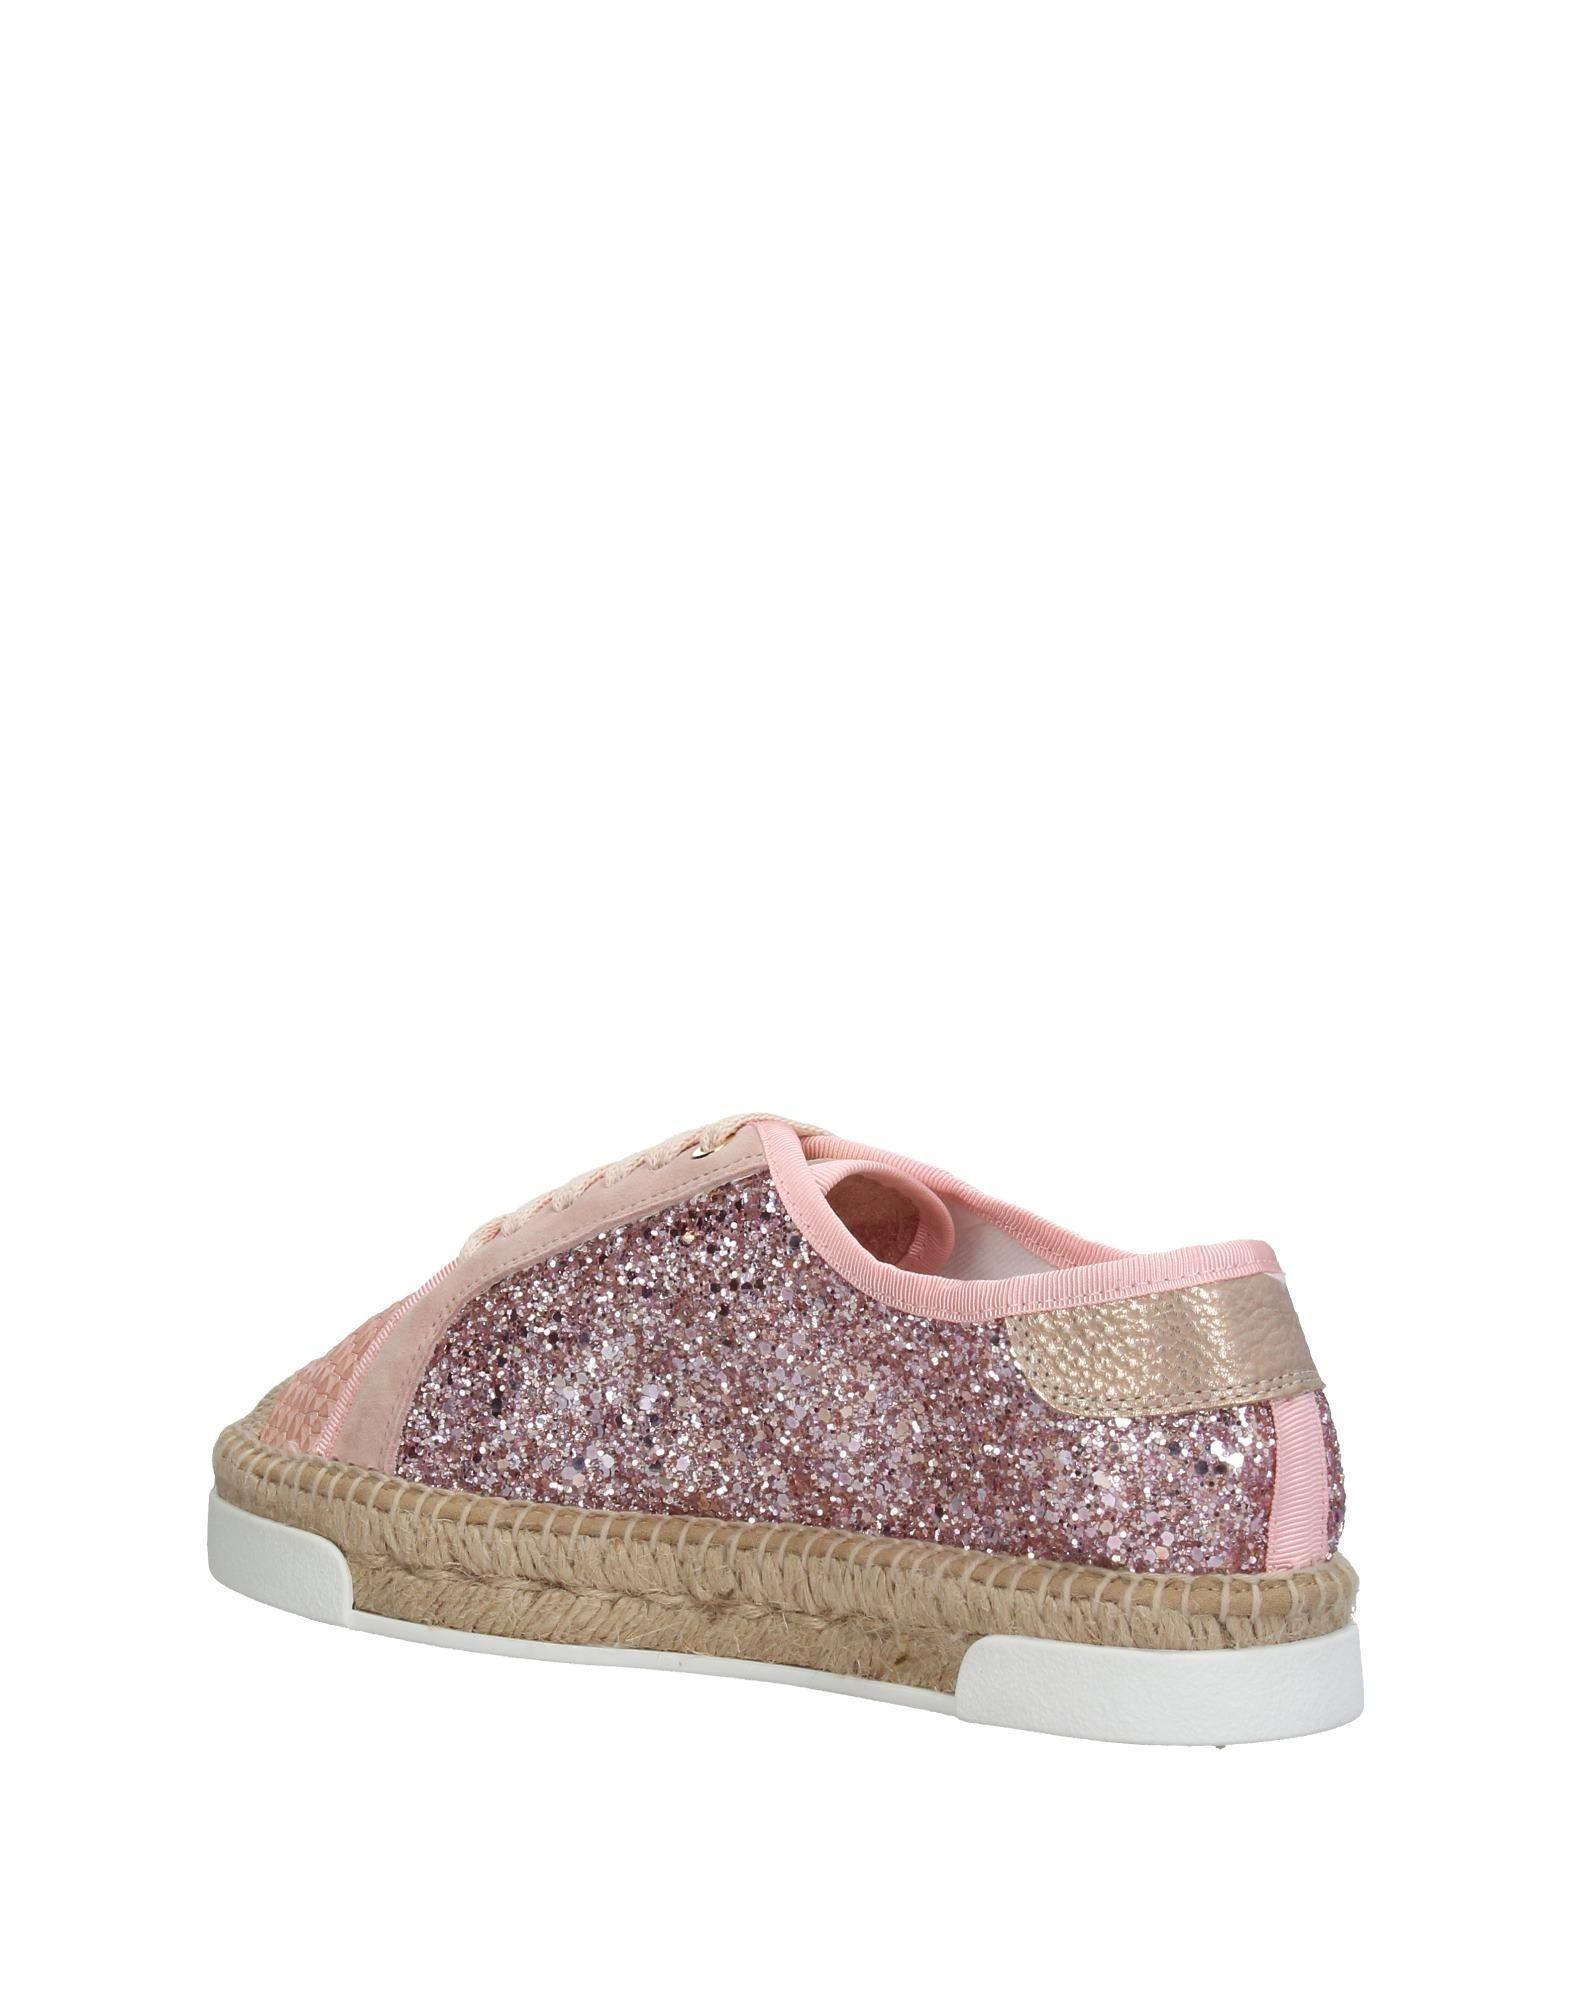 ... Sneakers Kanna Femme - Sneakers Kanna sur ...